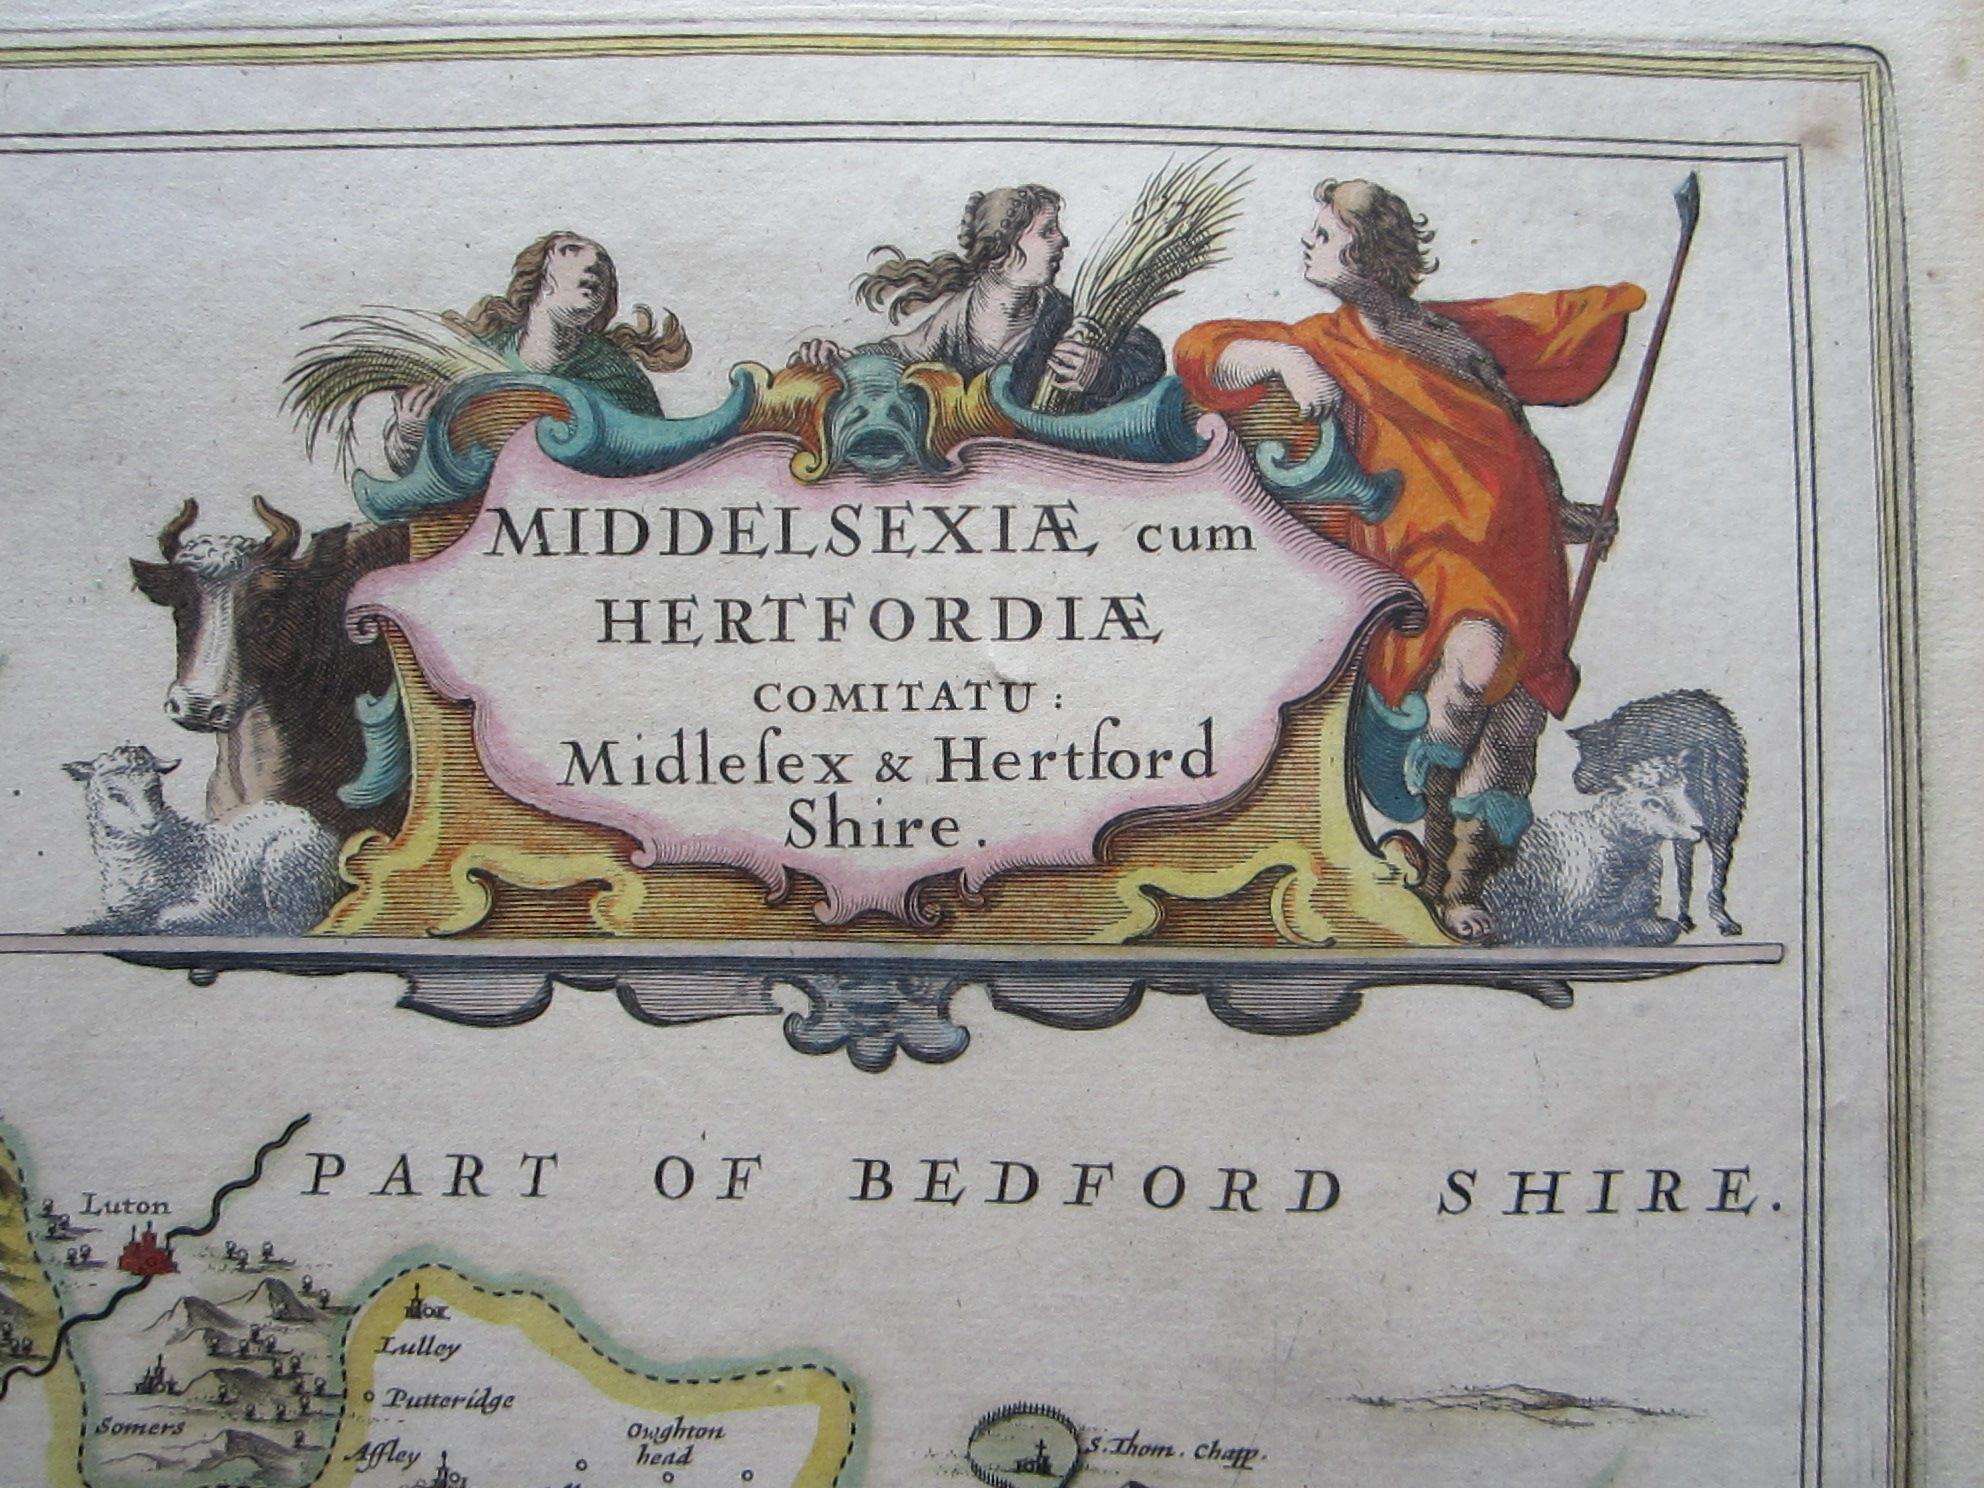 Middelsexiae cum Hertfordiae comitatu: Midlesex & Hertford Shire (photo 2)